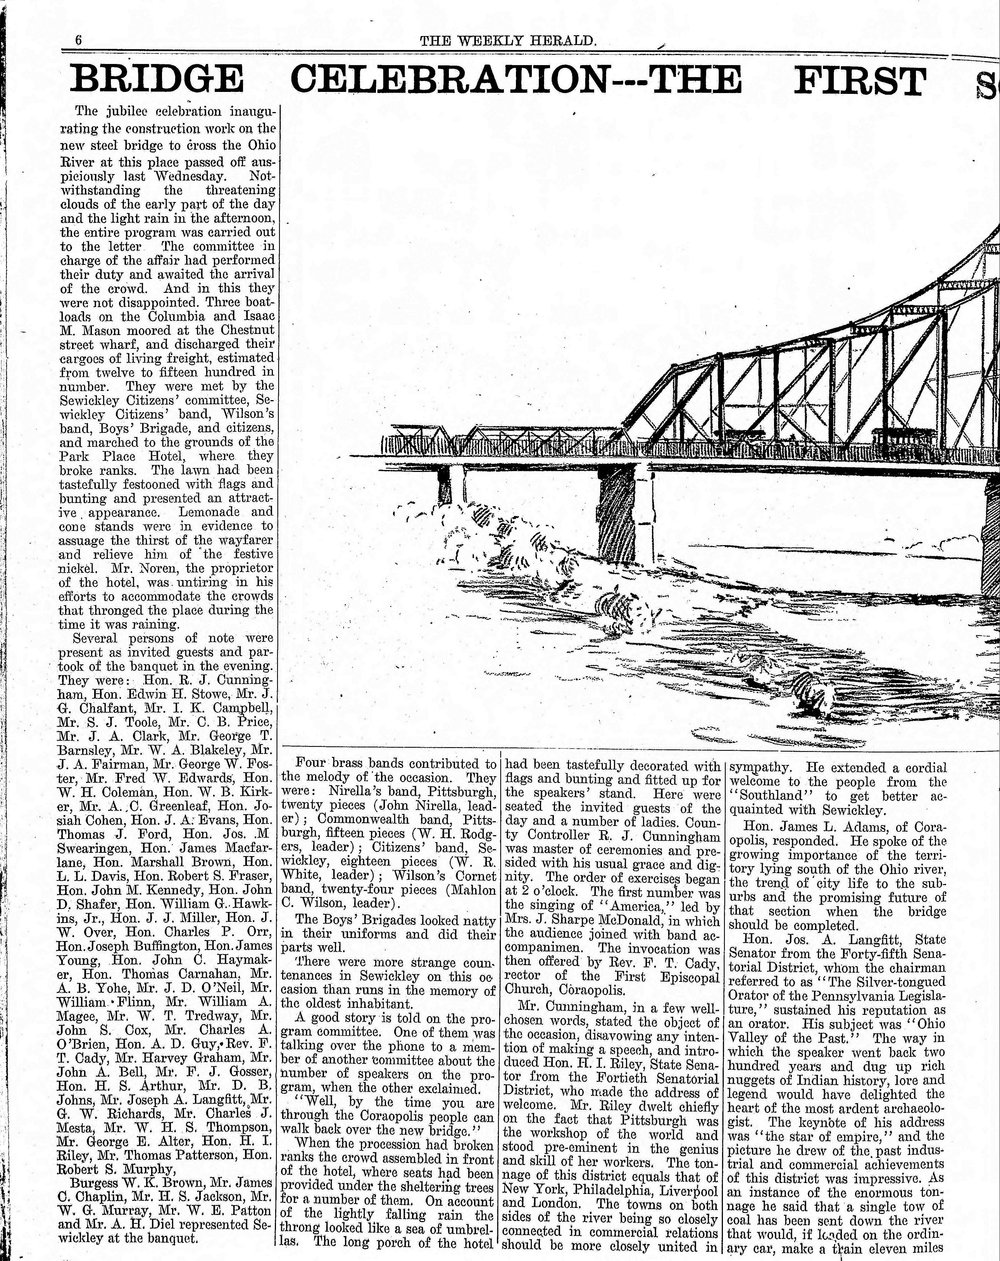 1909-07-24 The Weekly Herald (Sewickley Herald) - Bridge Celebration (pg6).jpg